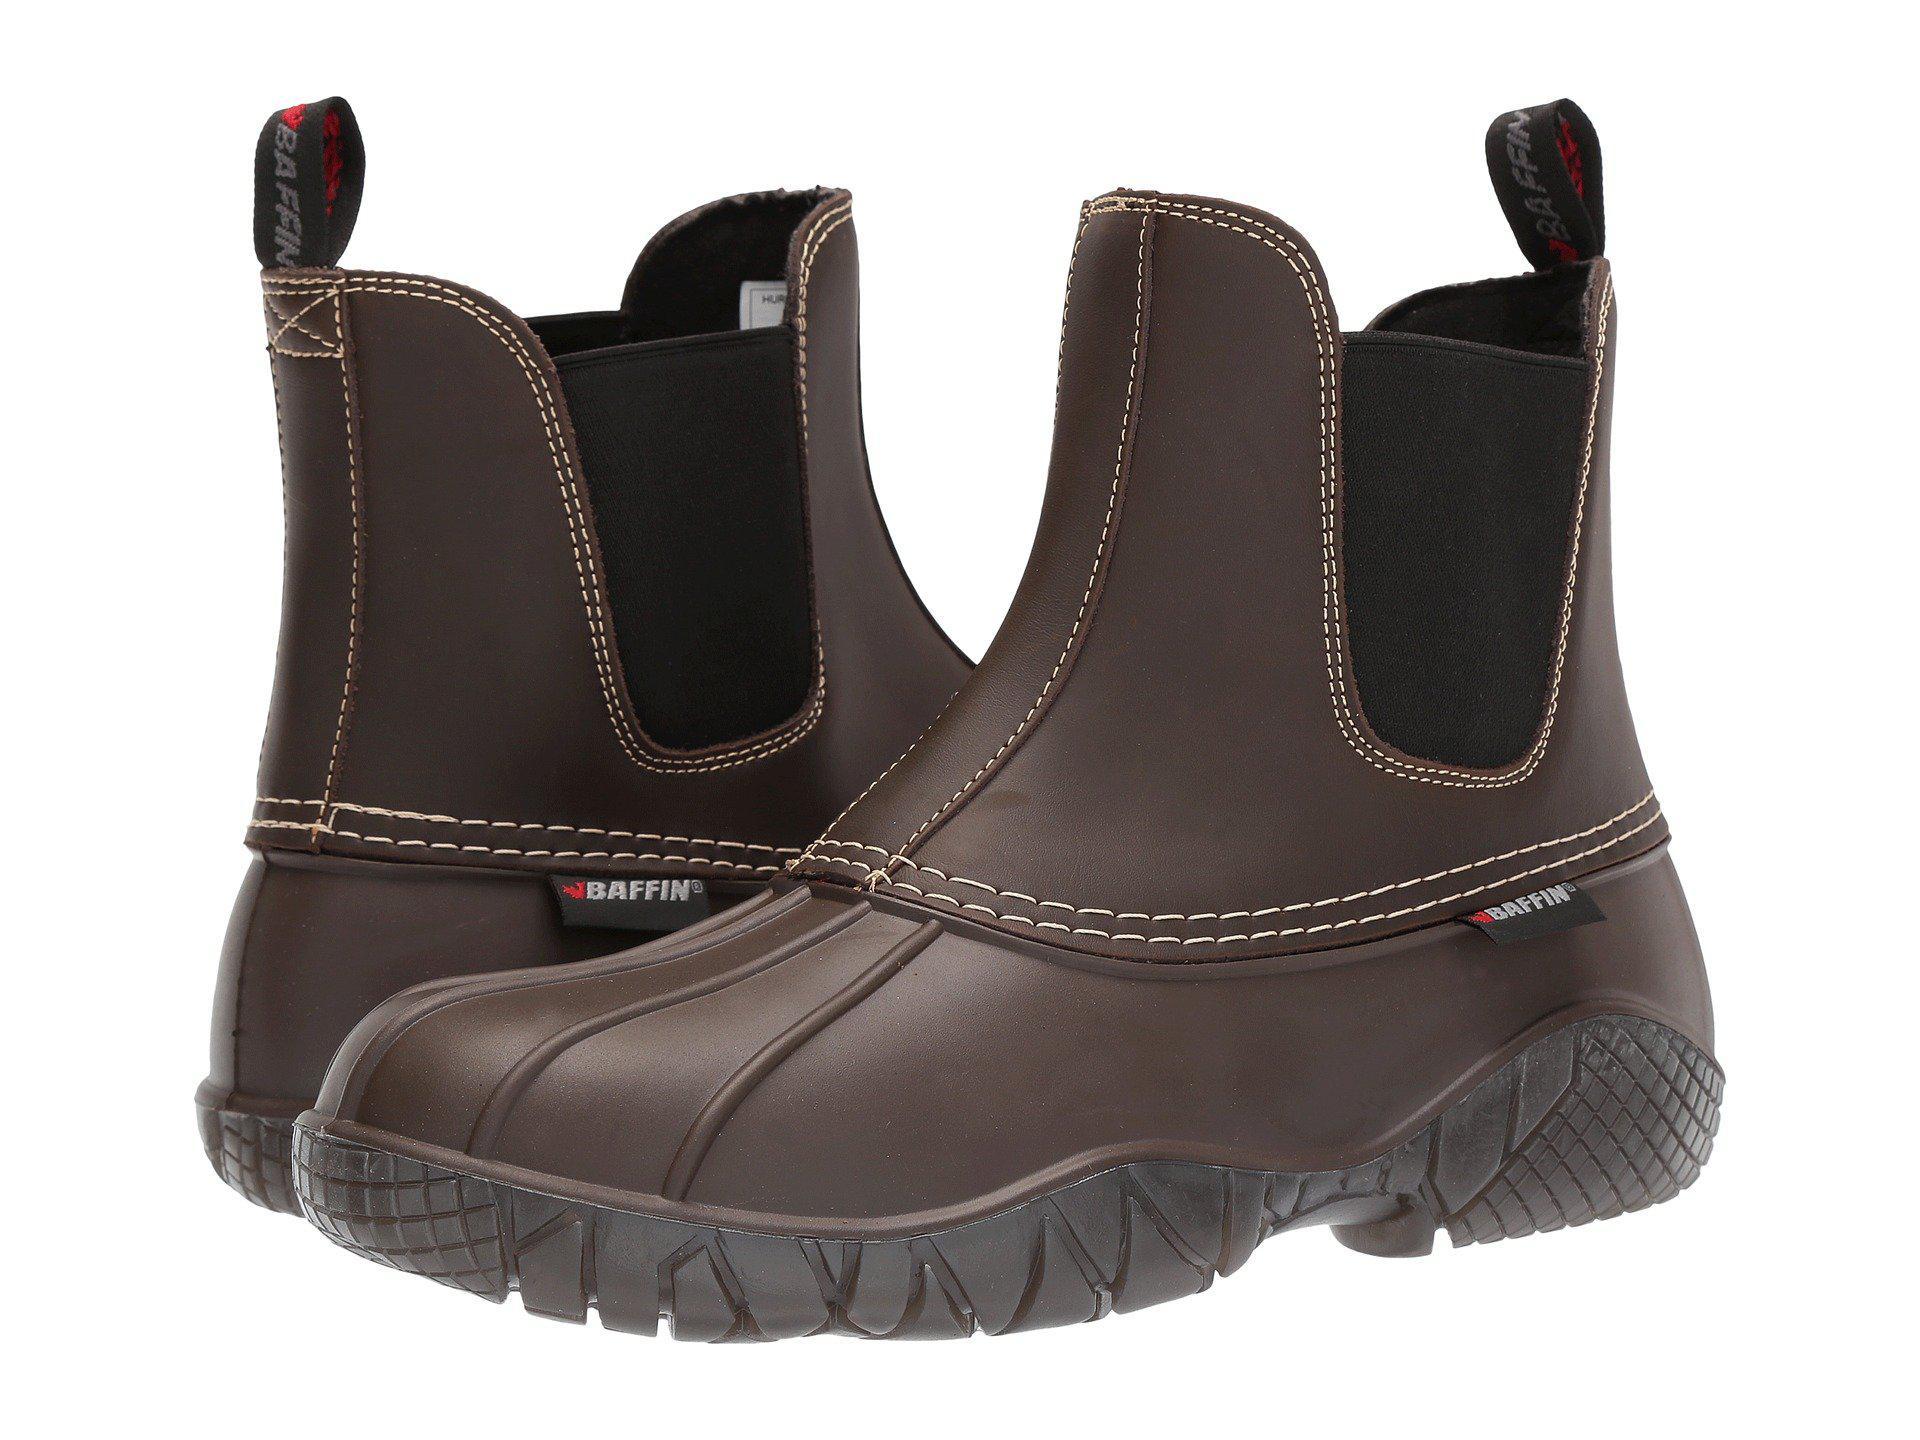 736fa2d3c7f Lyst - Baffin Huron (black) Men's Boots in Brown for Men